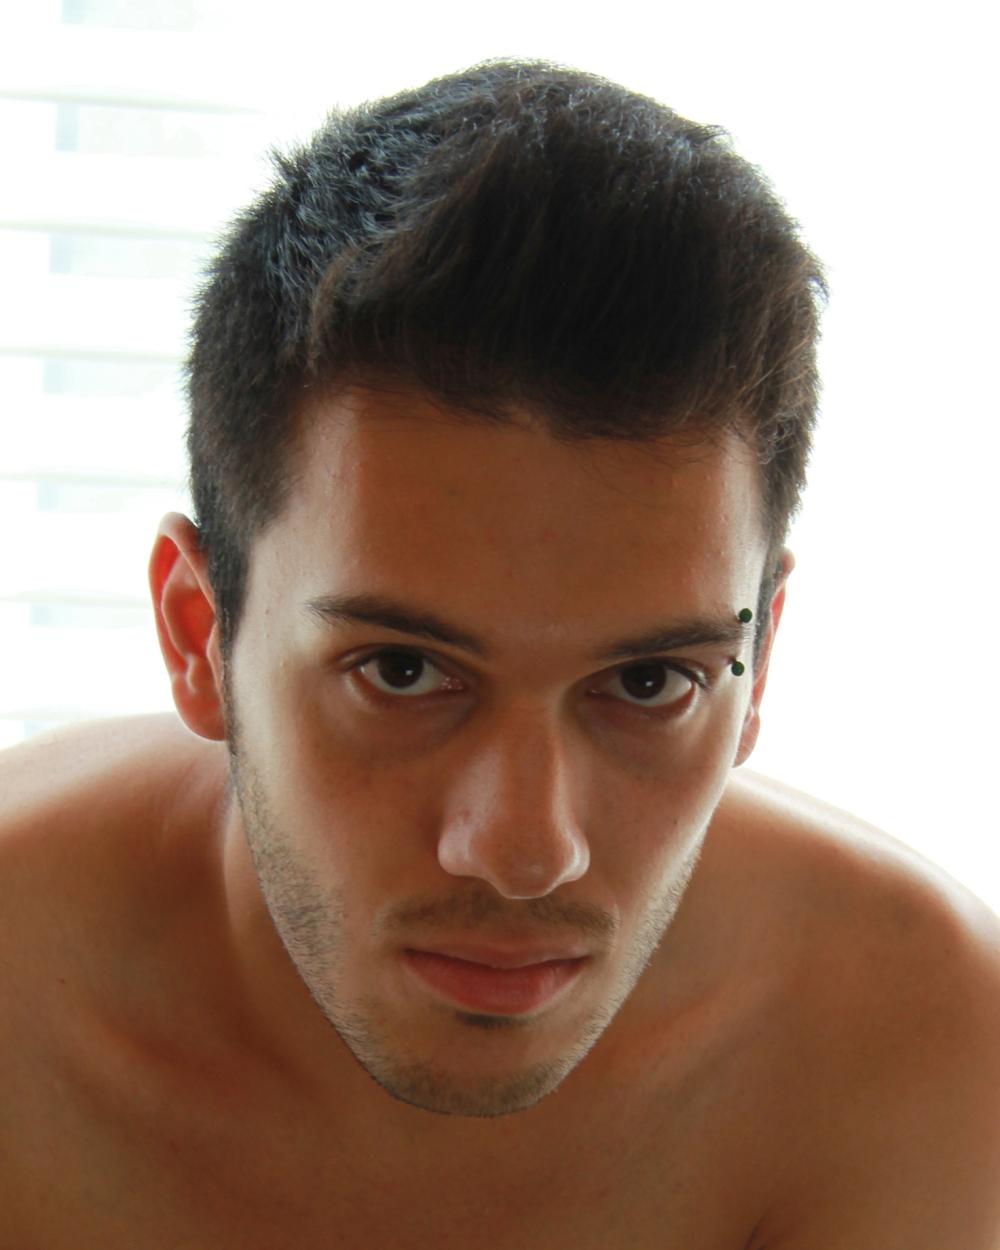 Model: Hasam